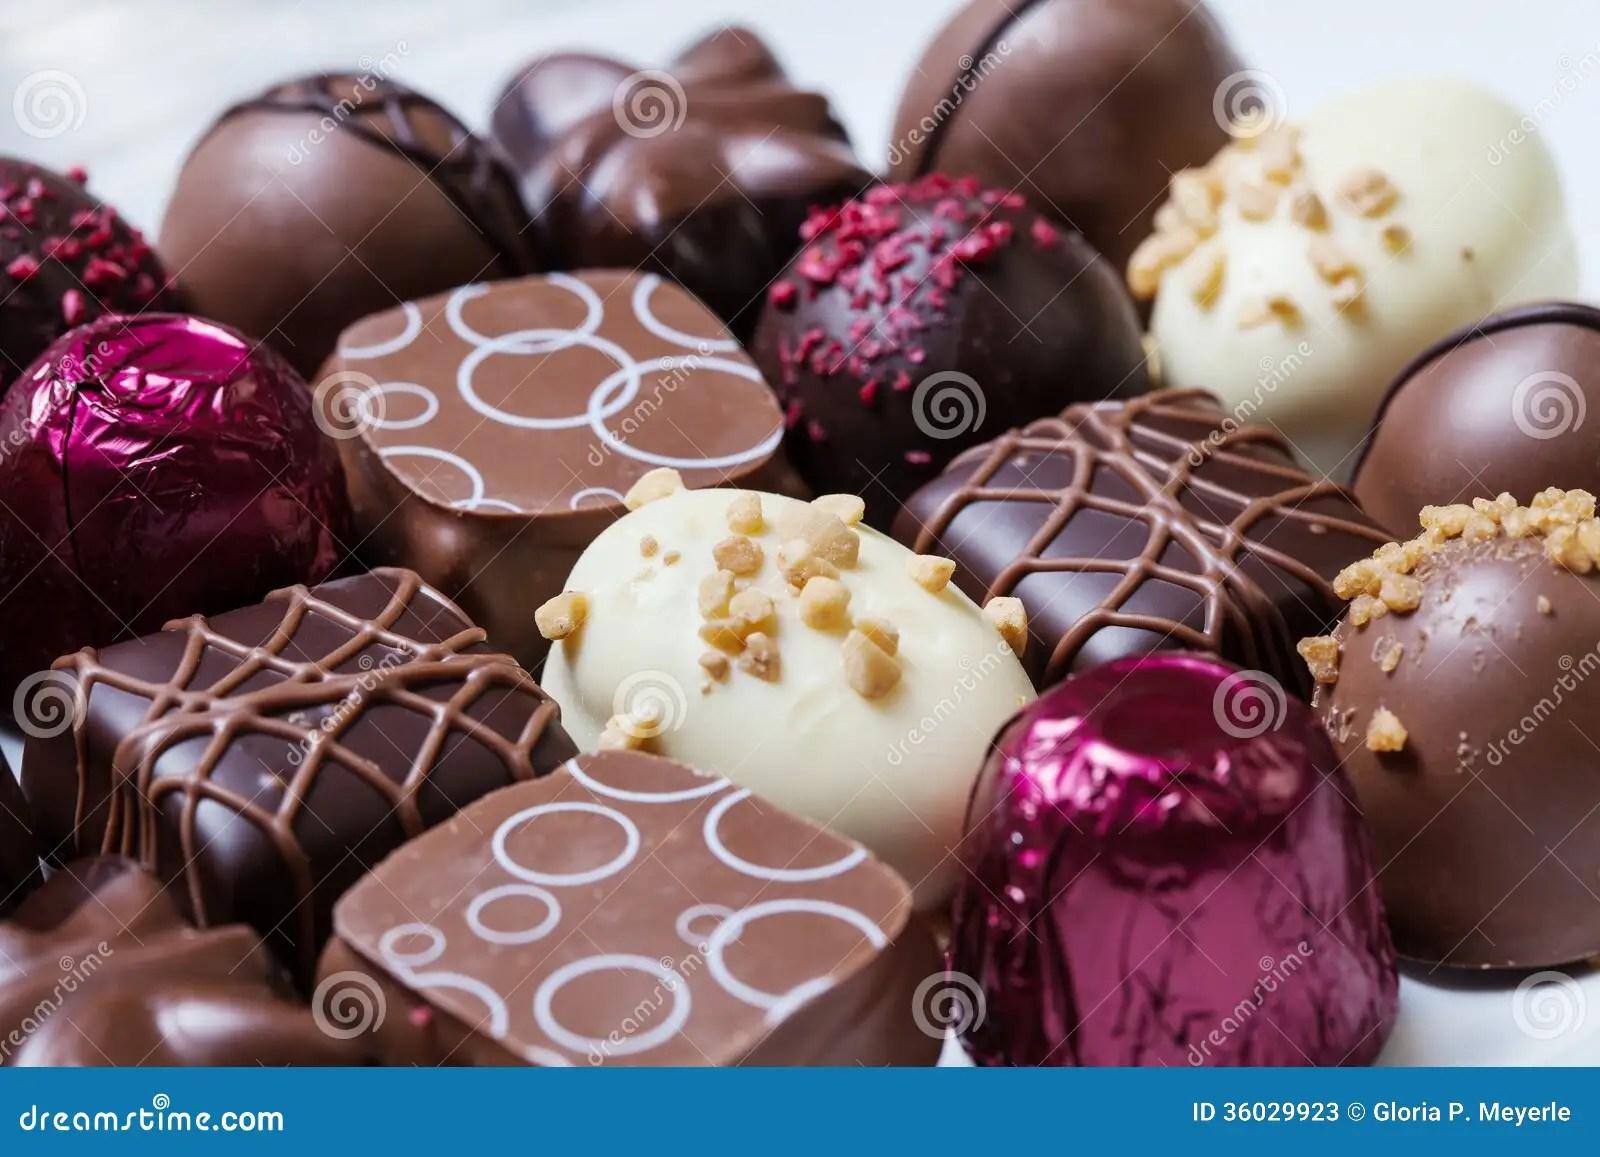 Gourmet Chocolates Stock Image Image Of Filled Holiday